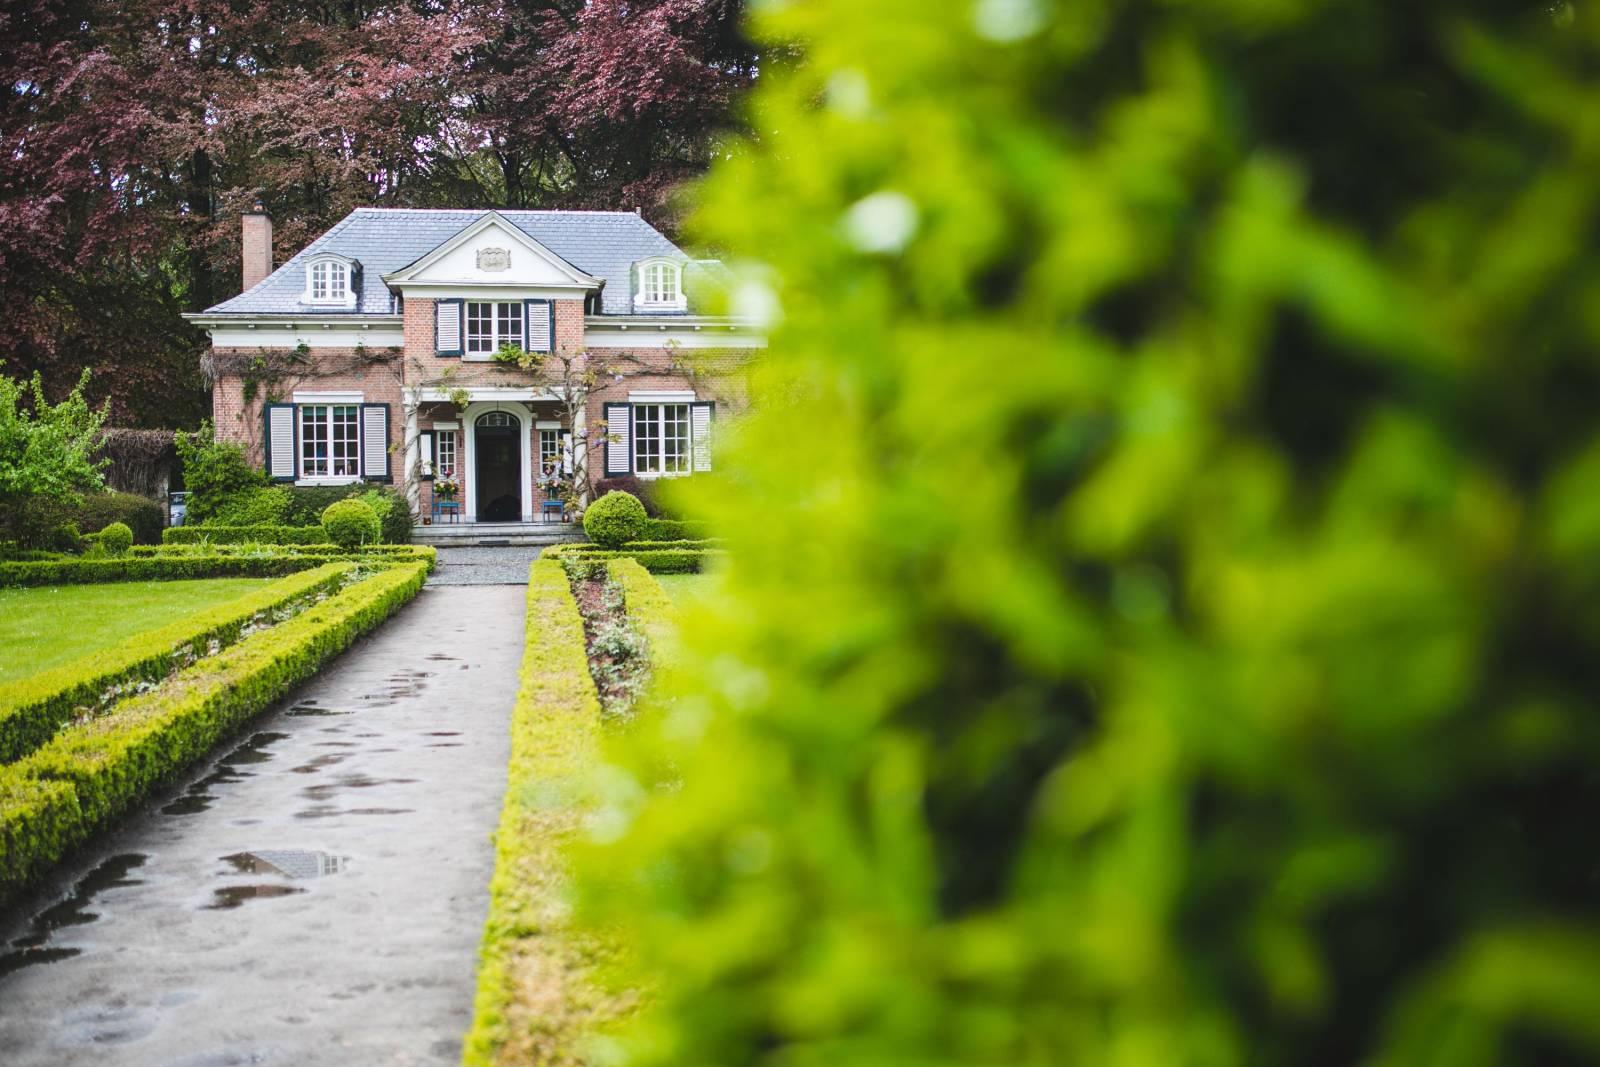 Wolvenbos - House of Weddings  - 5